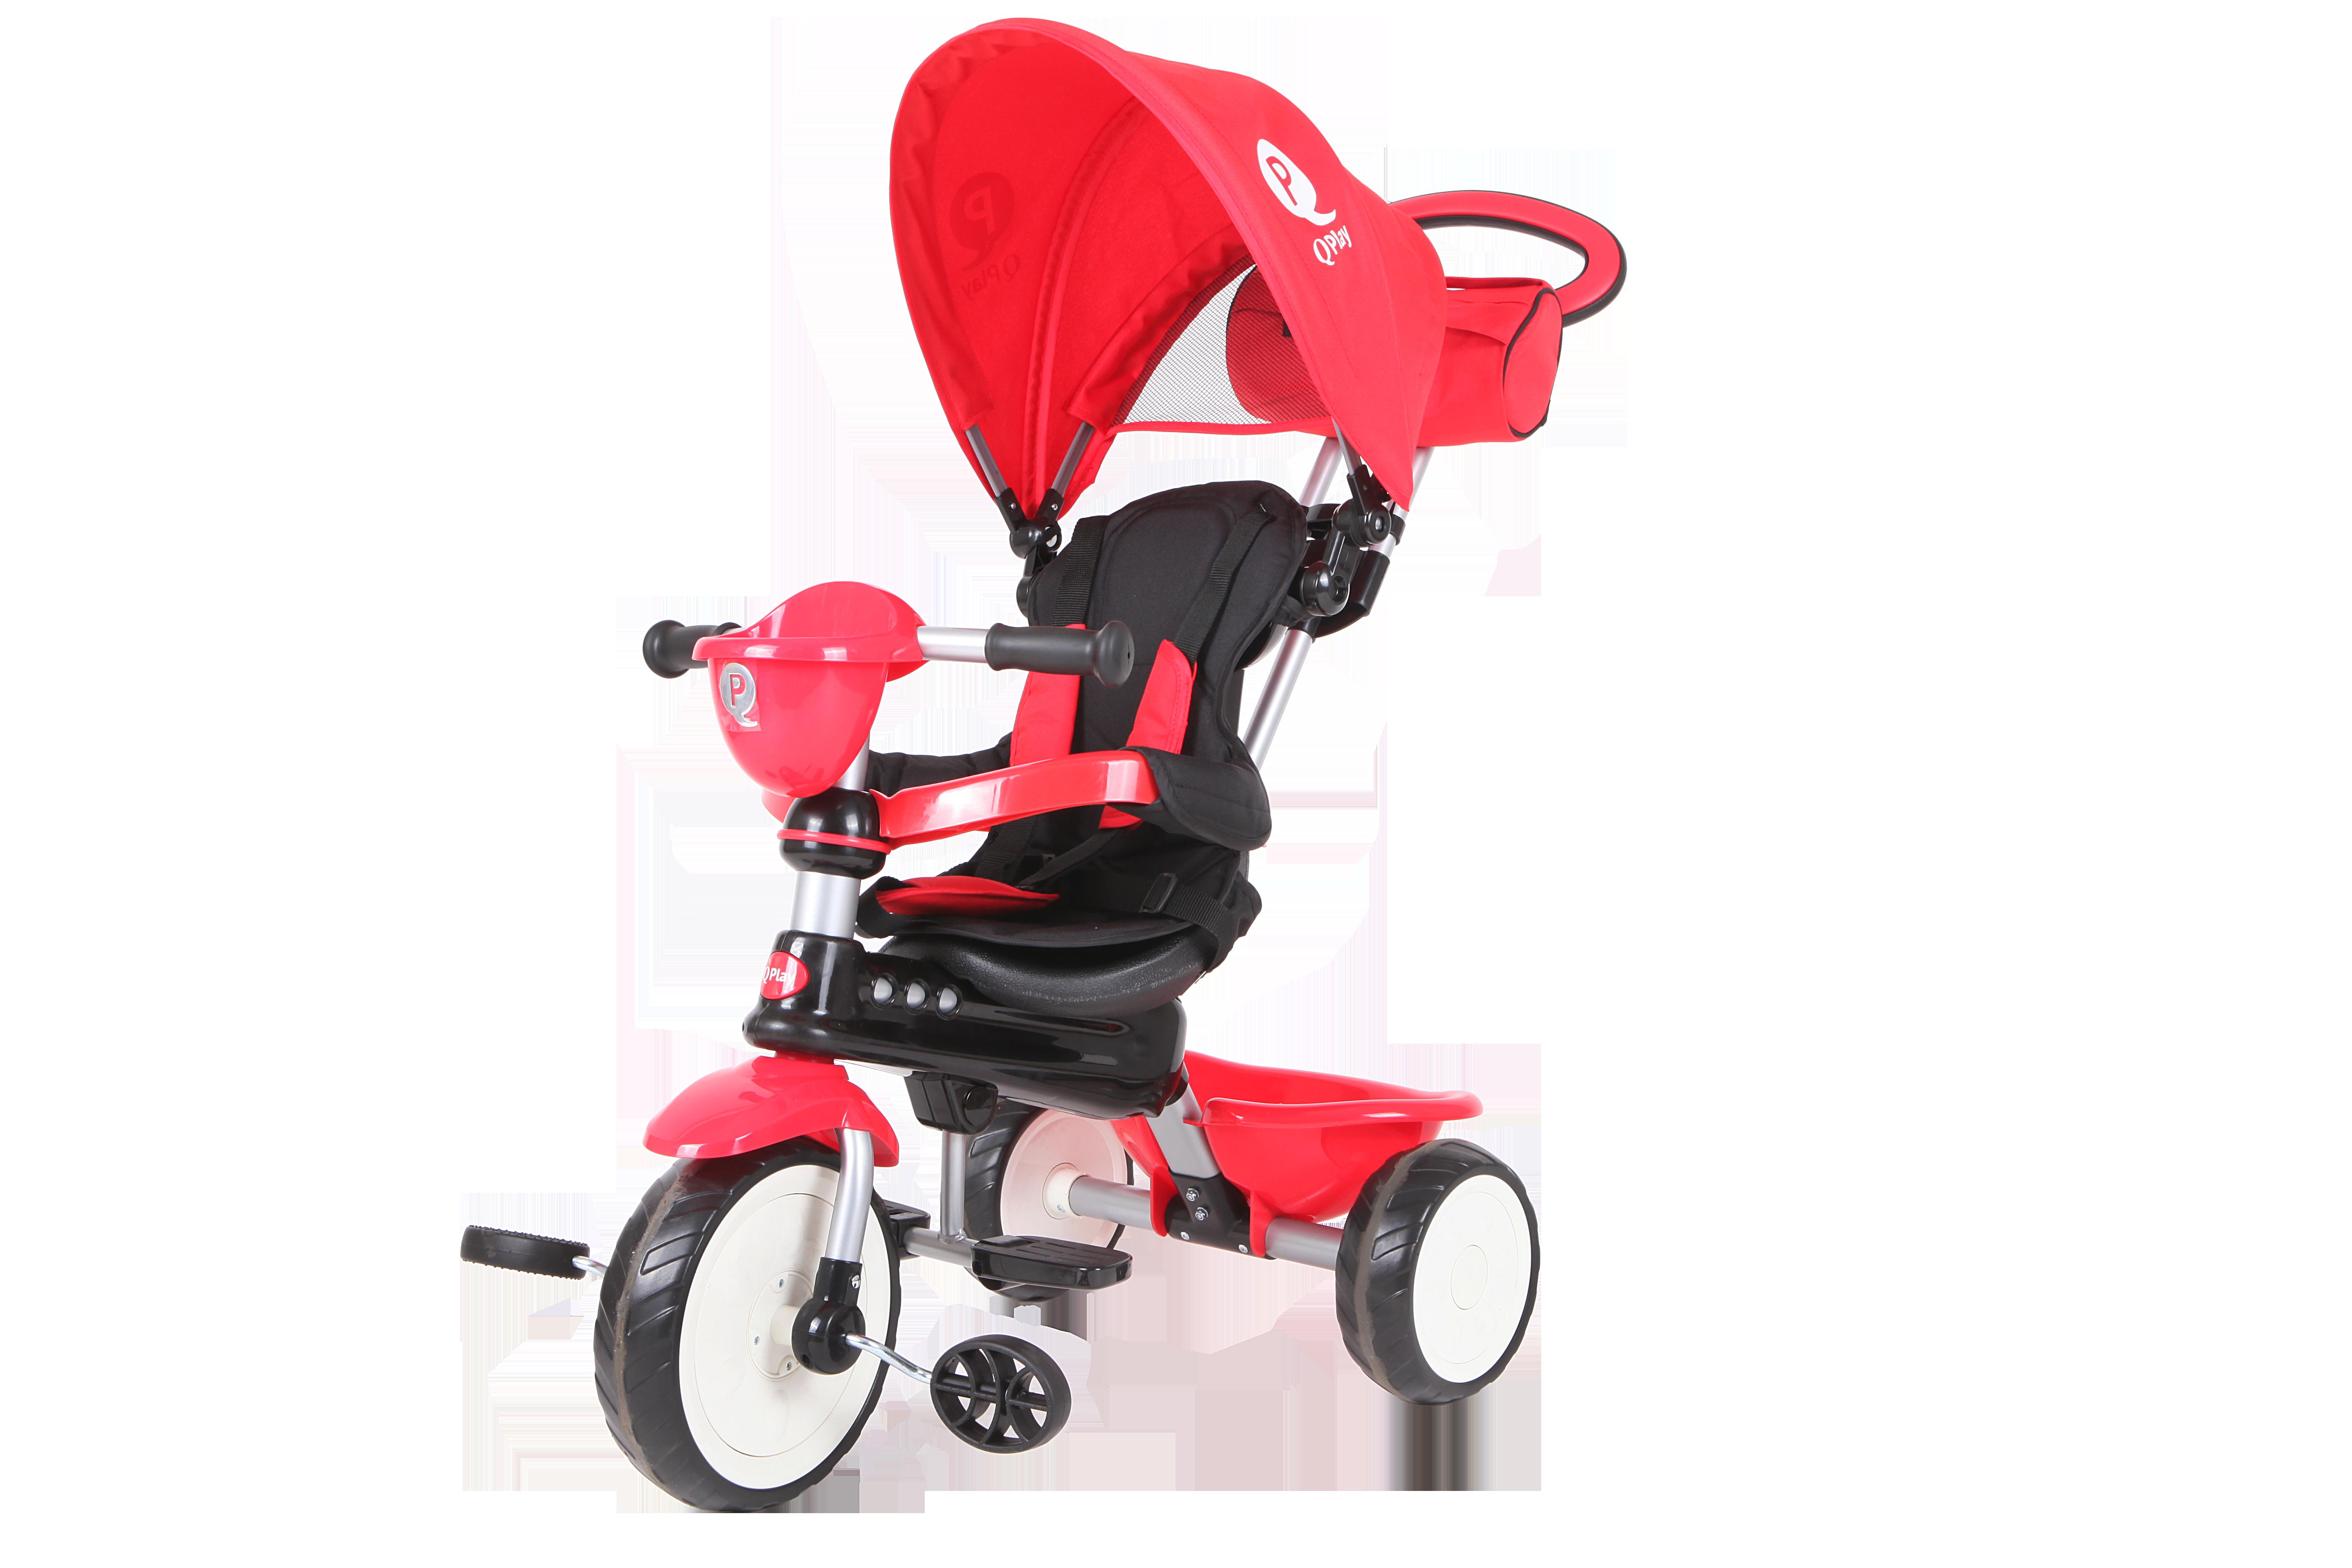 QPlay Τρίκυκλο Comfort Red 01-1212043-01